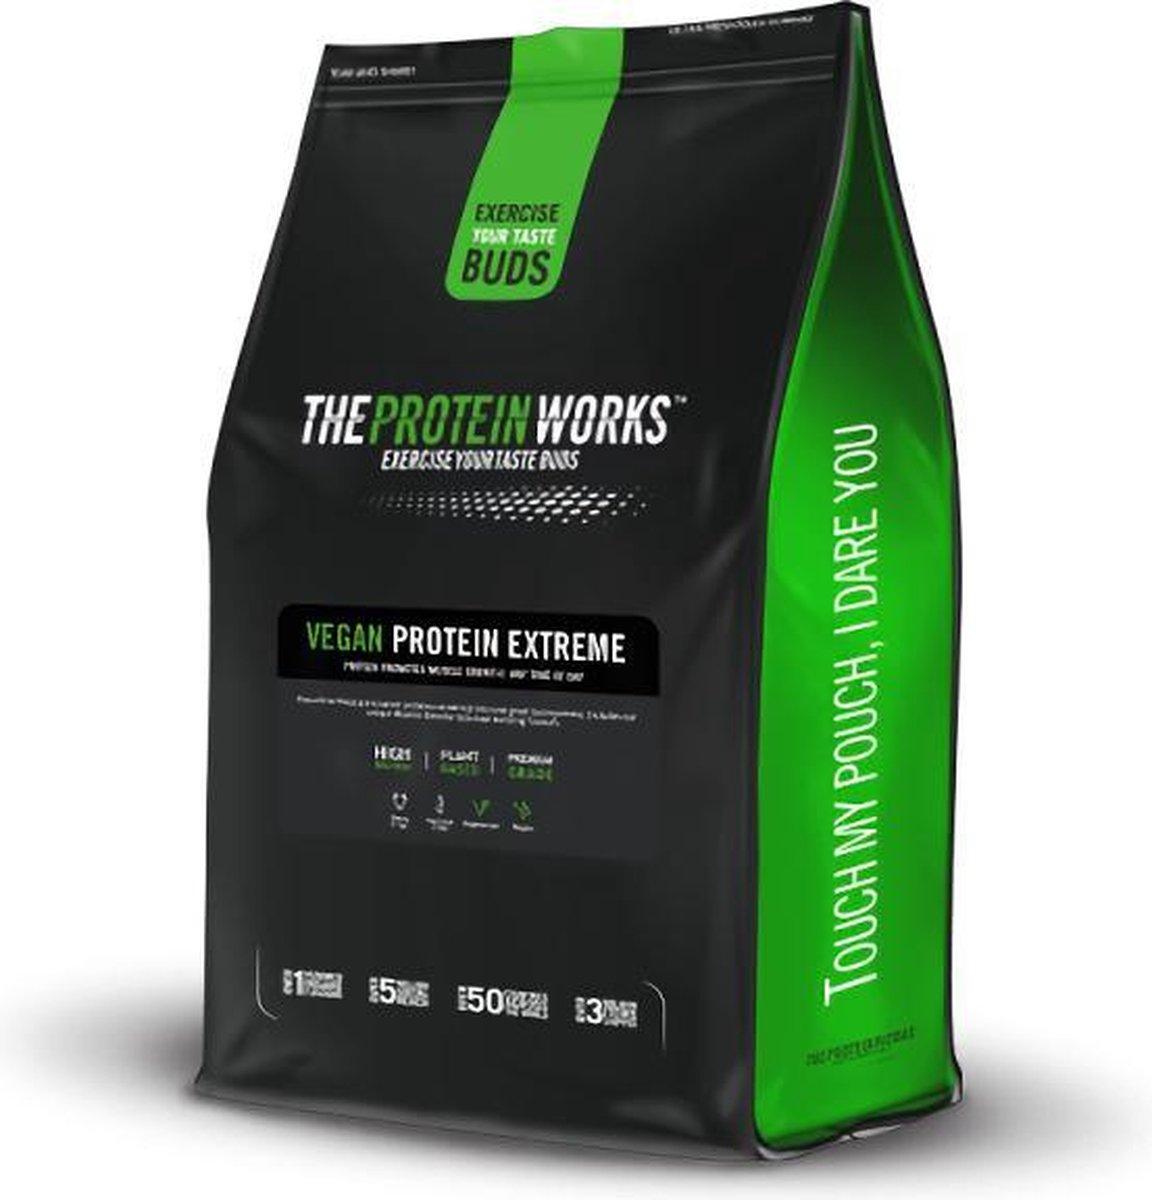 Vegan Protein / Vegan Proteïne - Vegan Proteïne Extreme / Vegan Protein Extreme - The Protein Works | Eiwitpoeder / Eiwitshake | 500 gram | Chocolate Silk